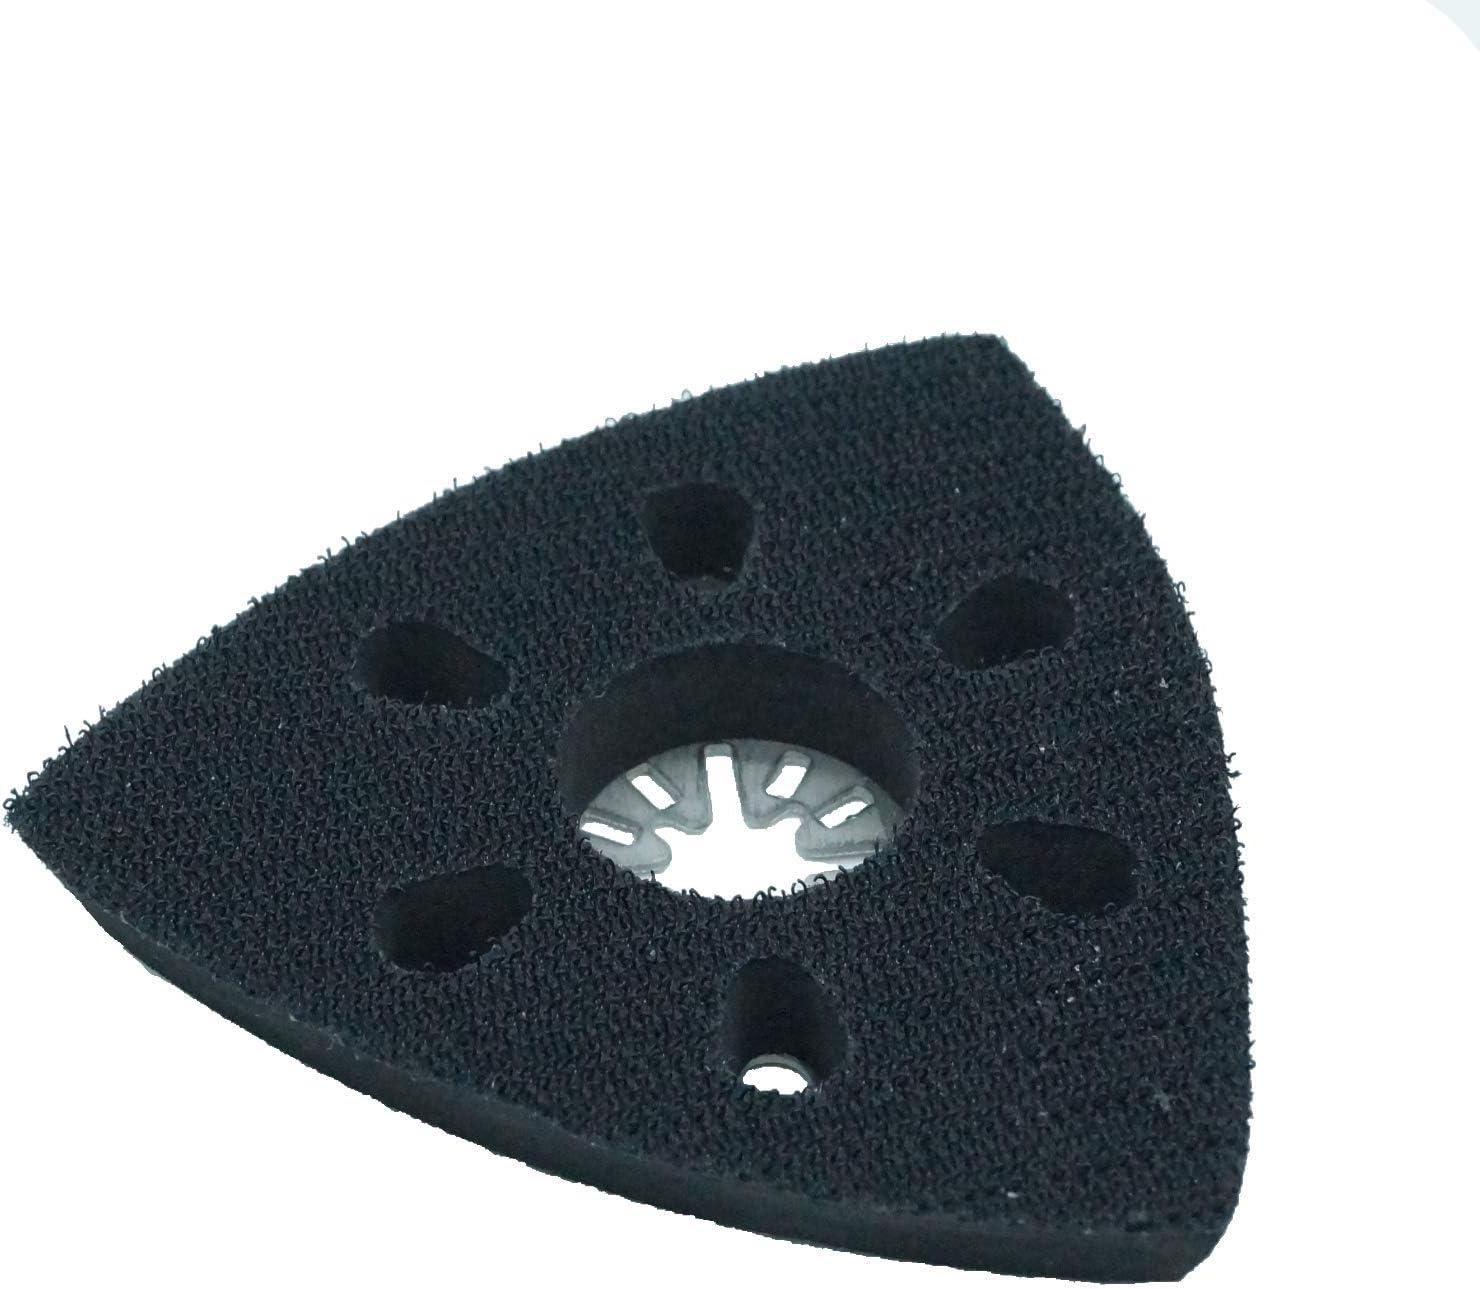 No-StarLock 1 x TopsTools UN90SP/_1 extra grande 90 mm x 90 mm almohadilla de lijado para Bosch Fein Makita Milwaukee Parkside Ryobi multiherramienta Worx WorkZone Multi herramienta accesorios